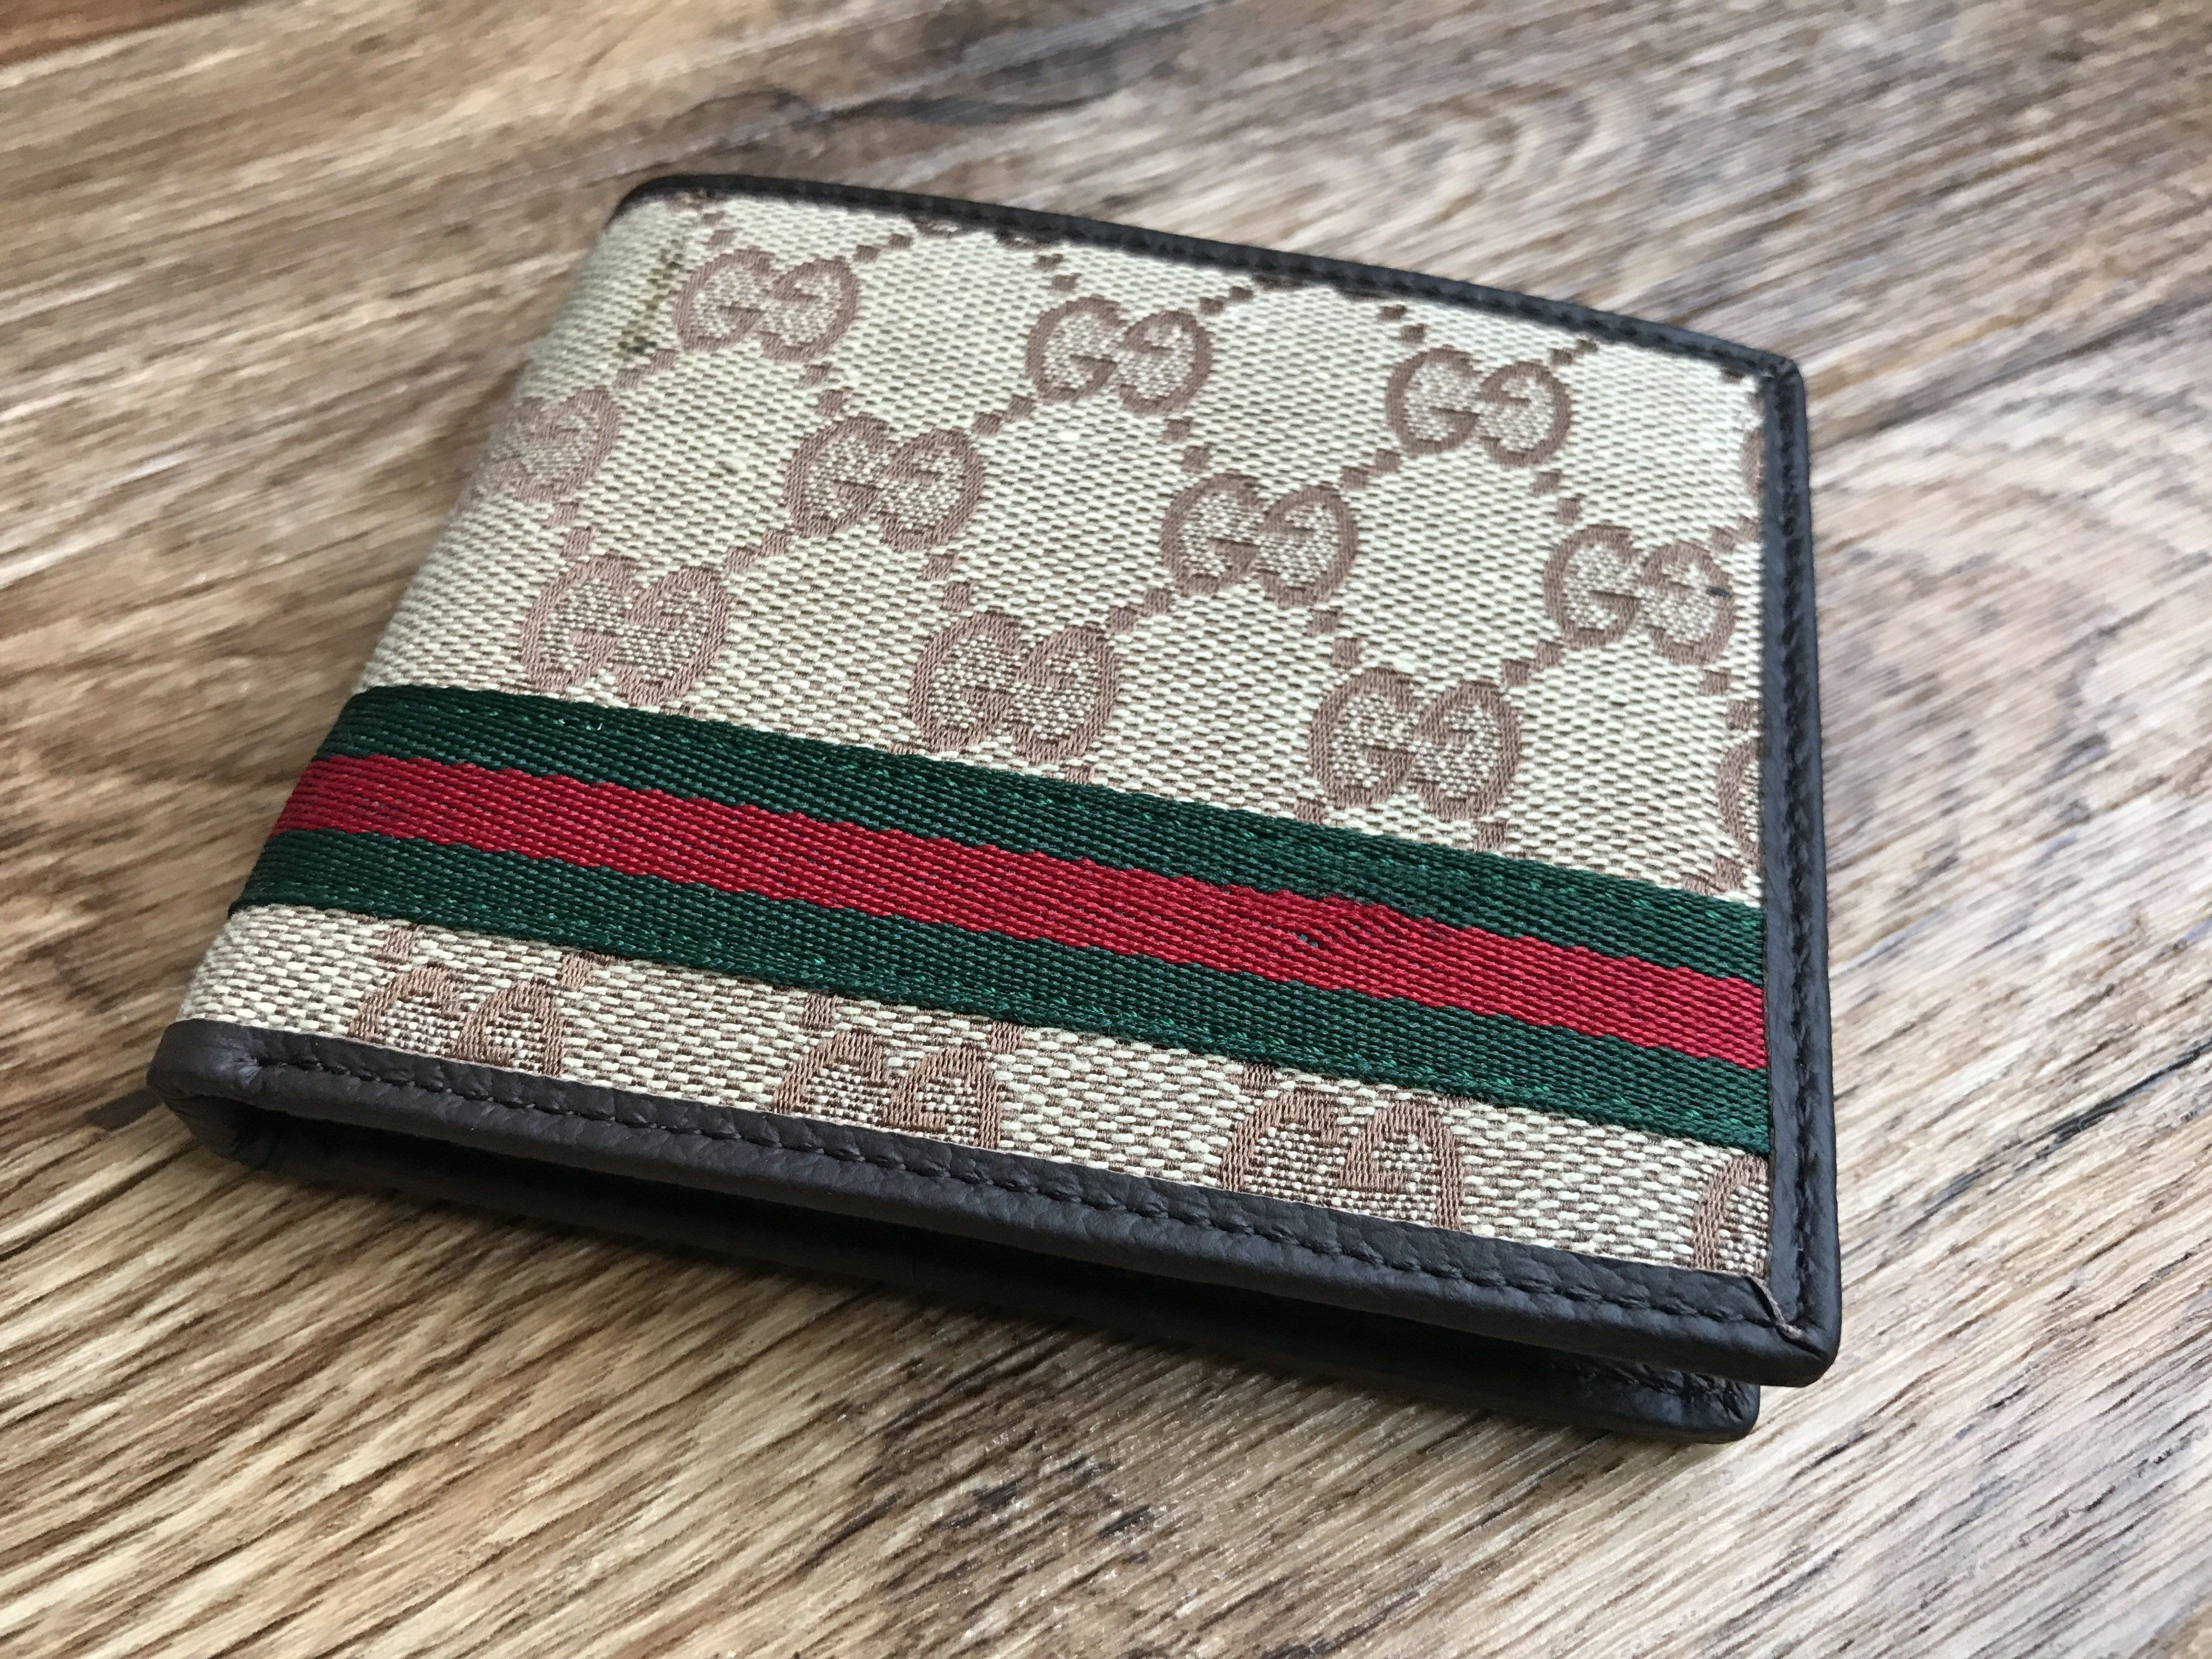 7f22d8197480 Gucci Wallet Mens Purse Web GG Supreme wallet Bi Fold Credit Card Holder  Wallet Made in